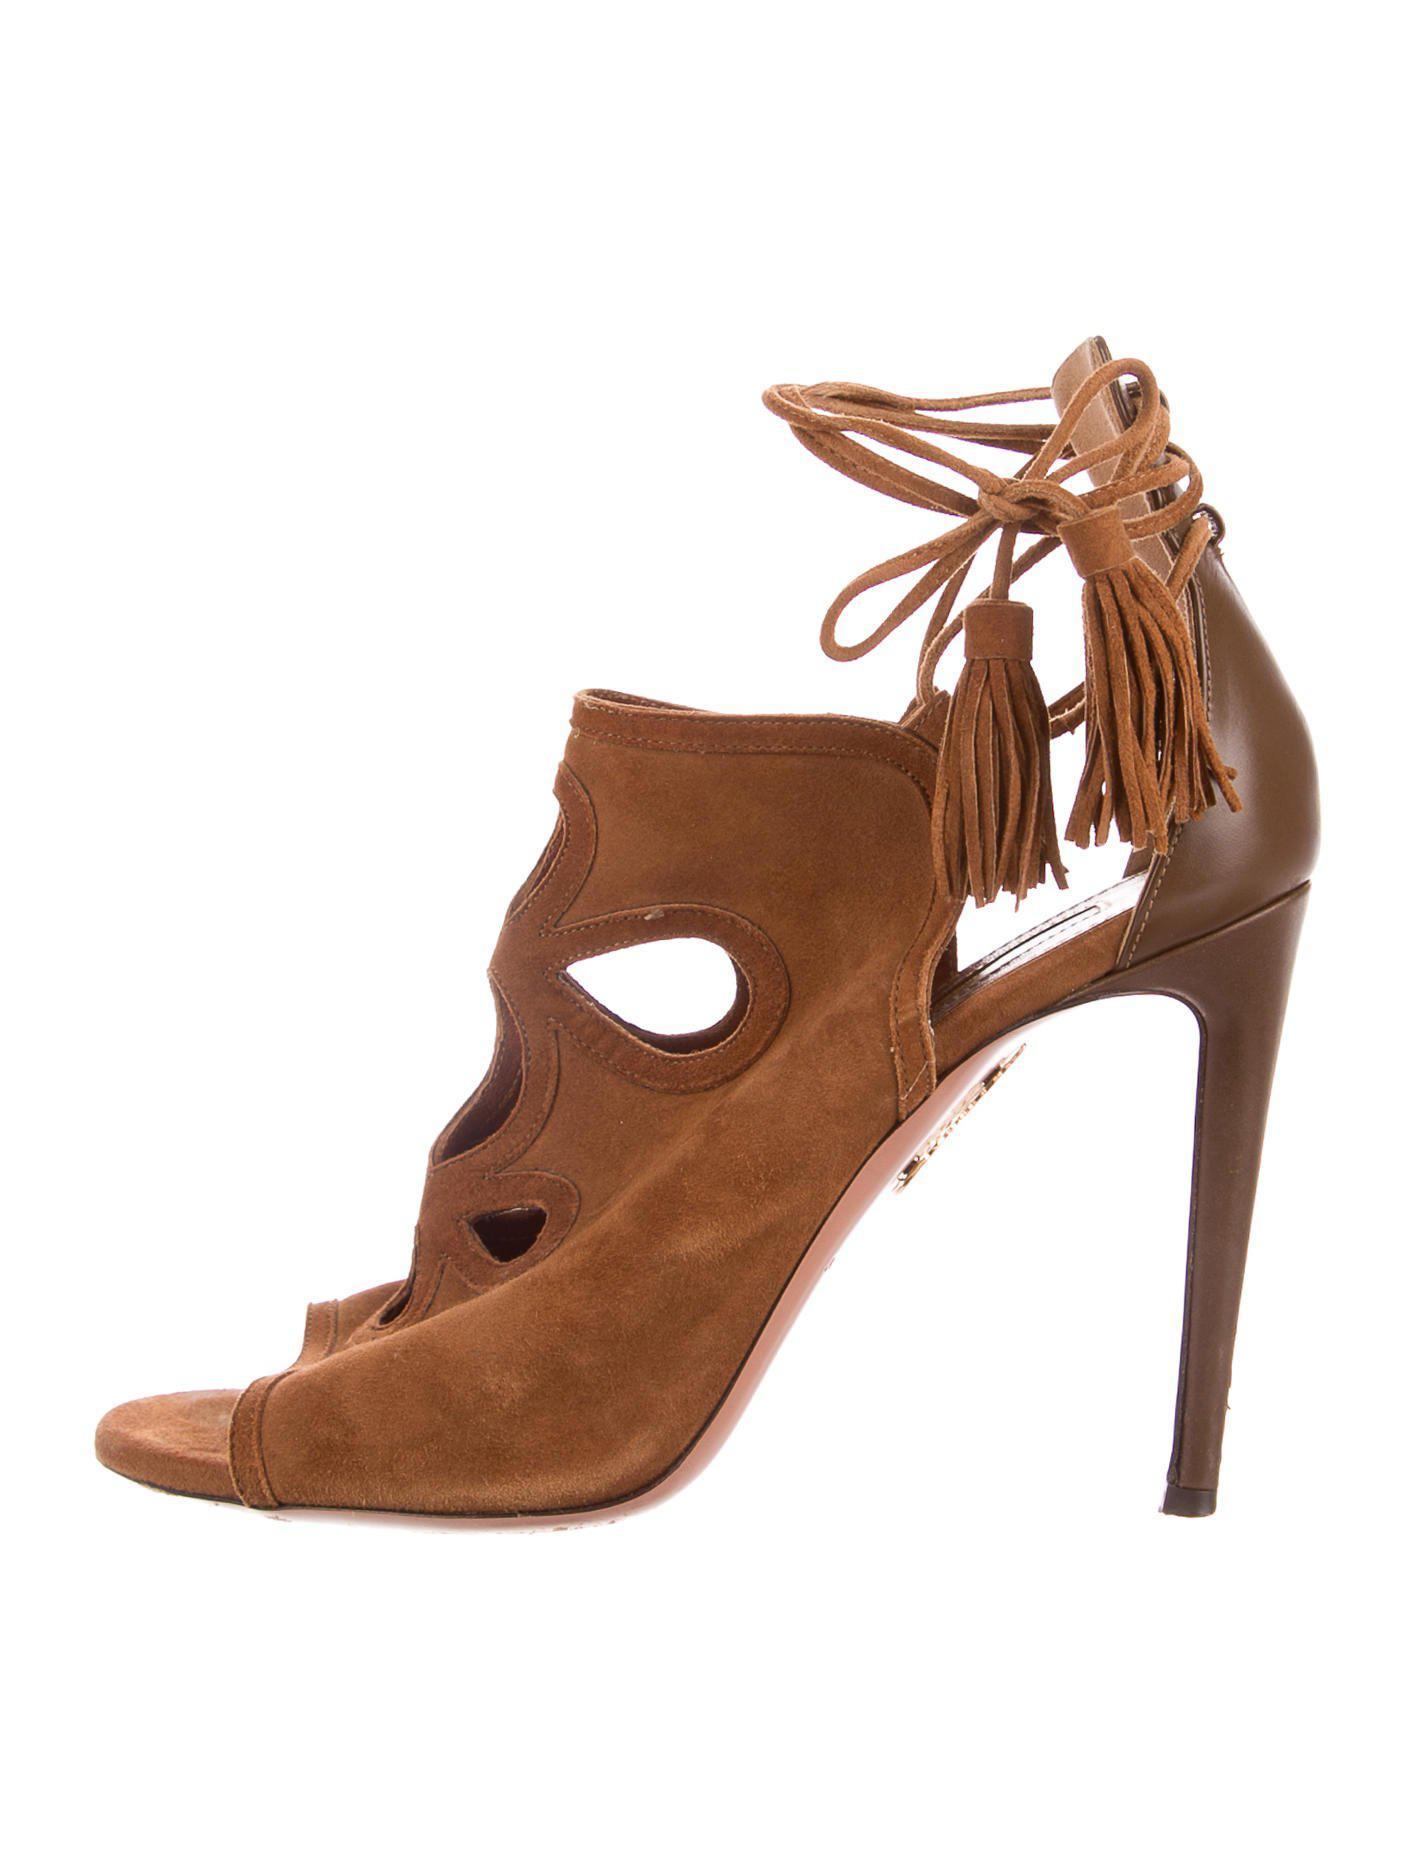 Aquazzura Get Me Everywhere Cutout Sandals cheap prices bMiuNos